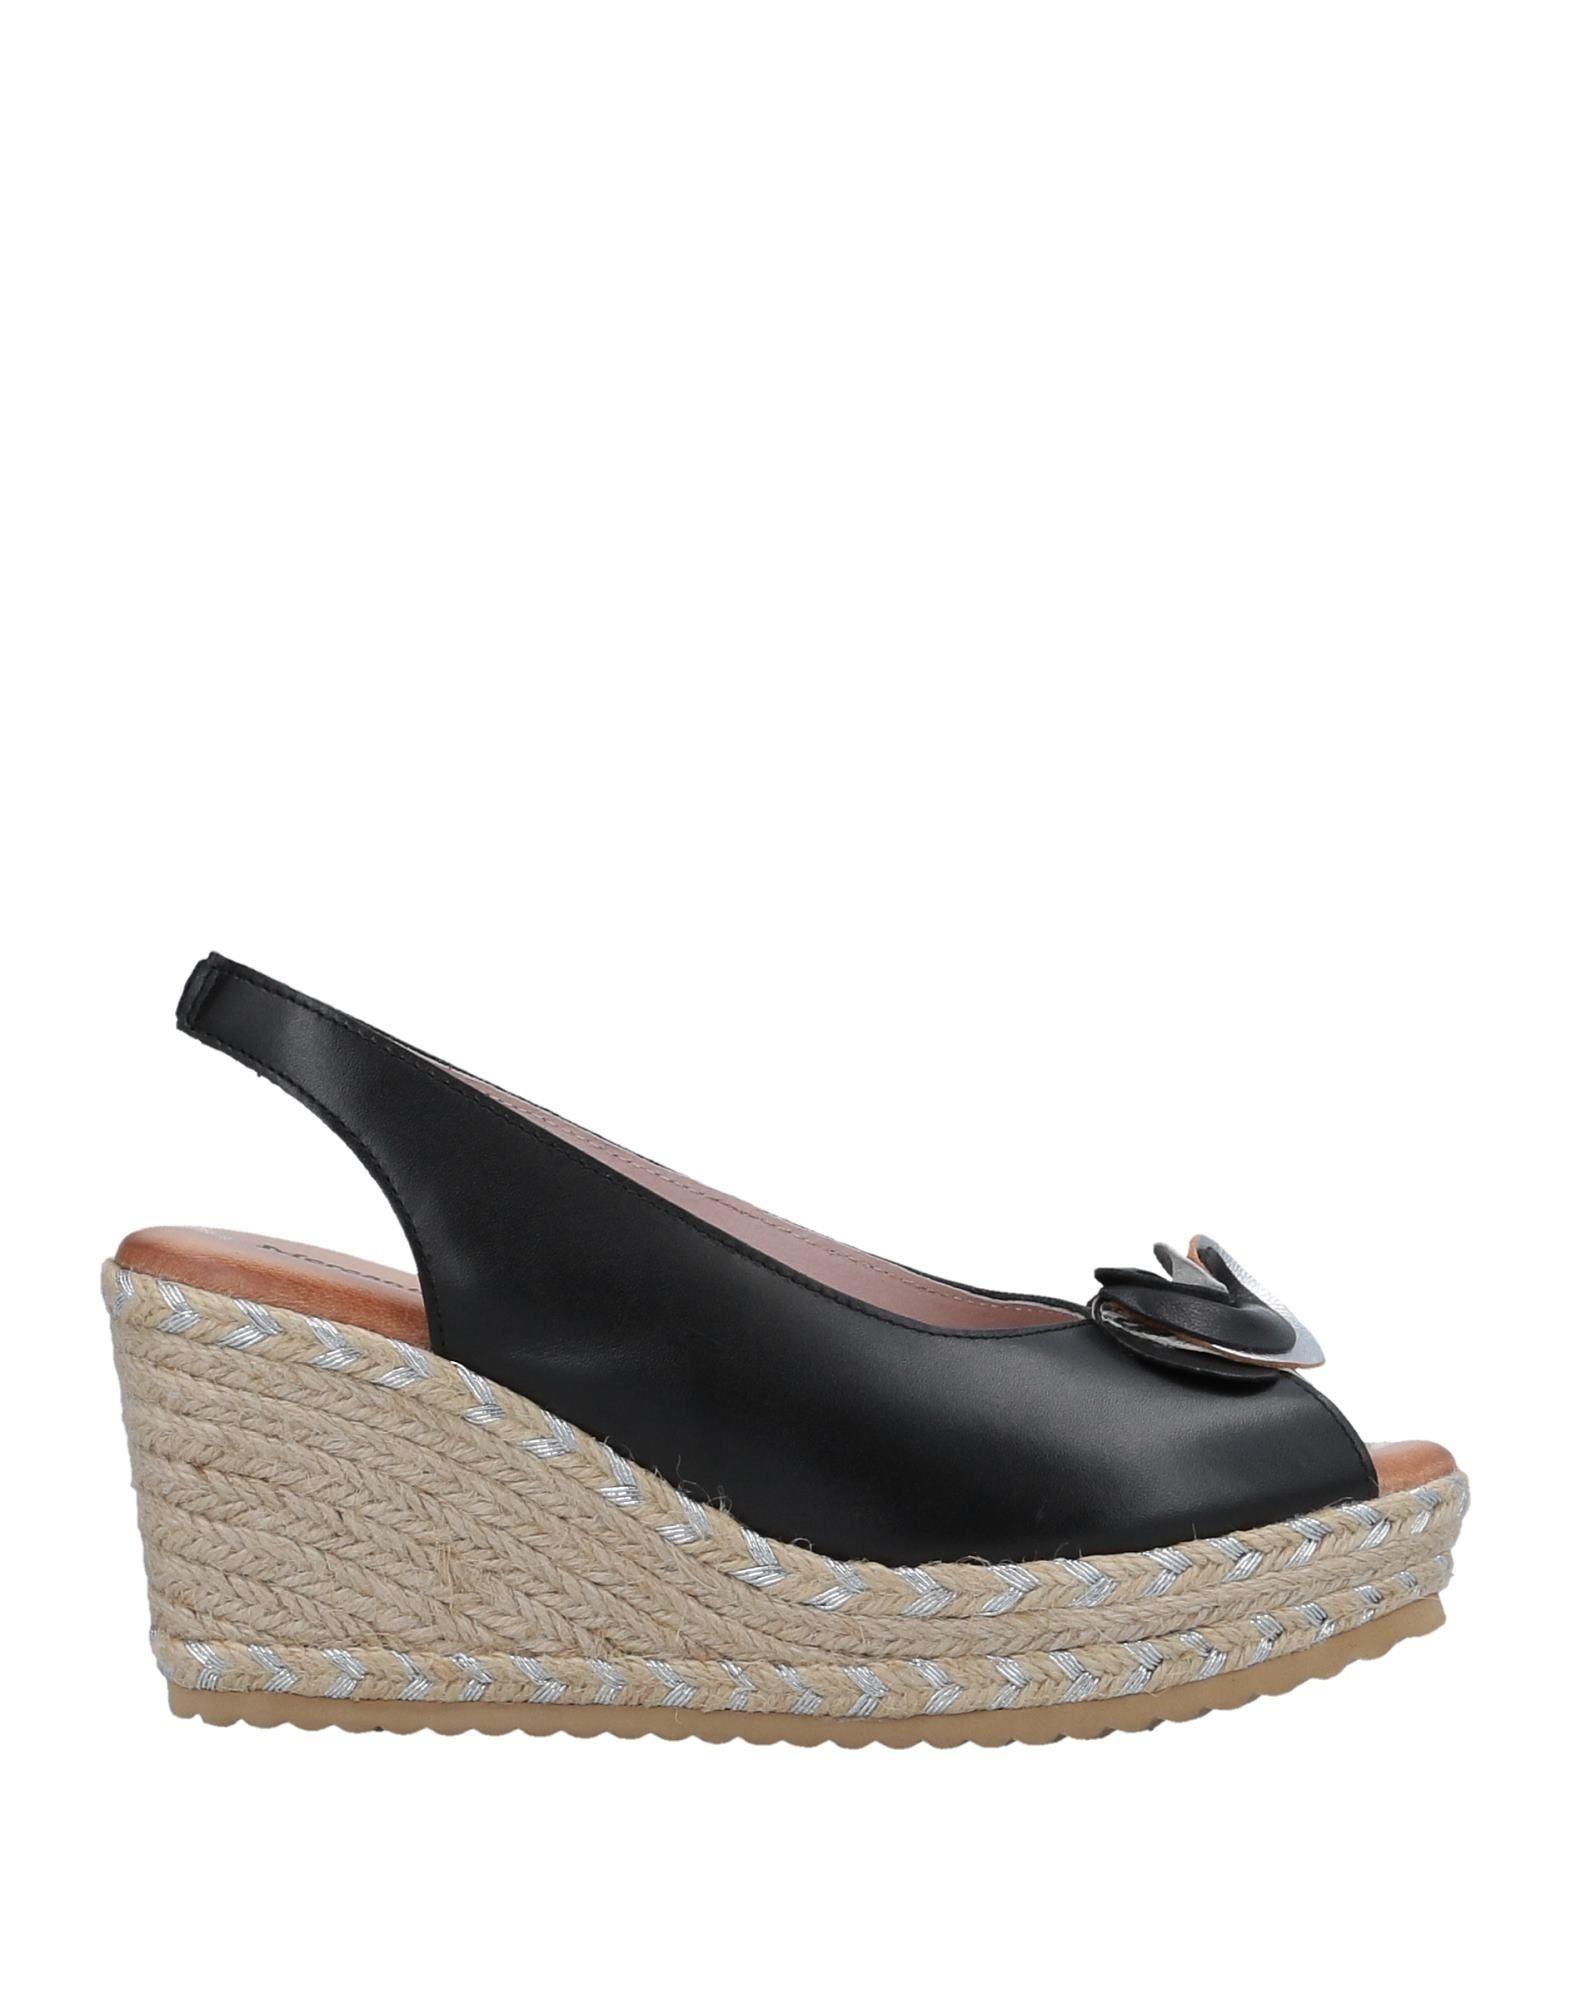 Mercante Di Fiori Sandalen Damen  11340038GI Gute Qualität beliebte Schuhe